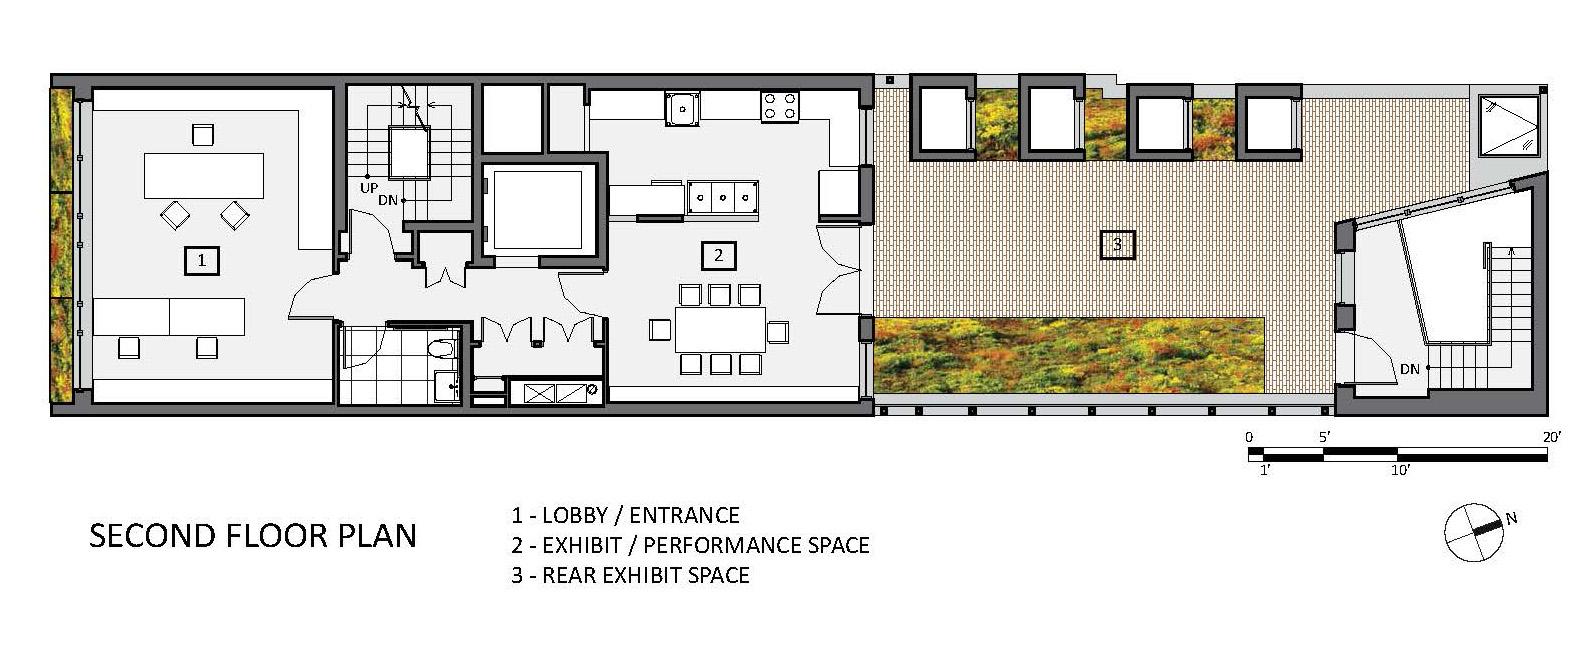 Second_floor_plan.jpg